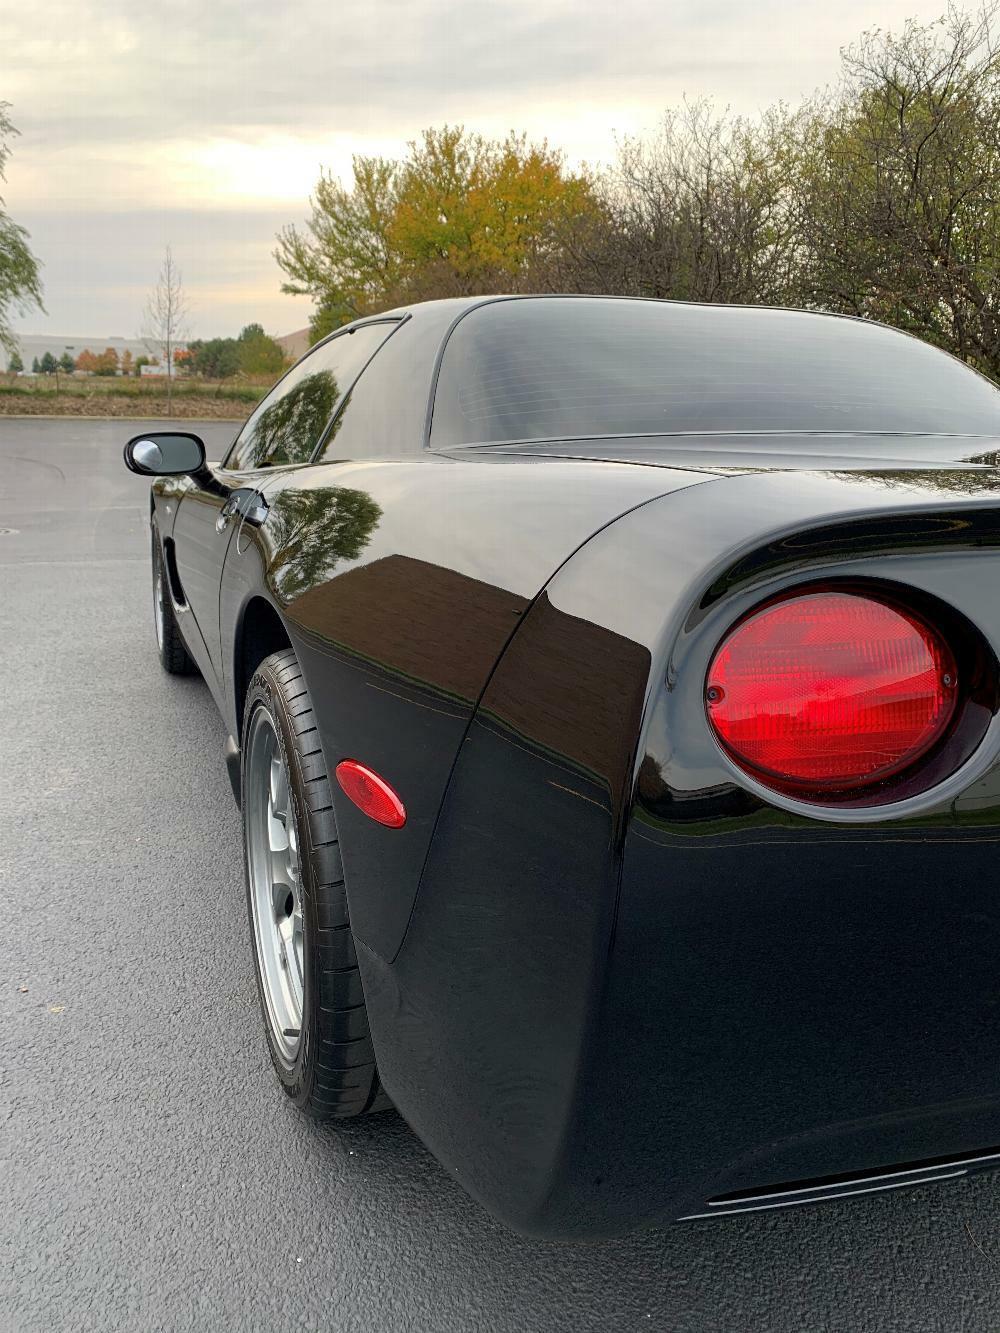 2002 Black Chevrolet Corvette Z06  | C5 Corvette Photo 8